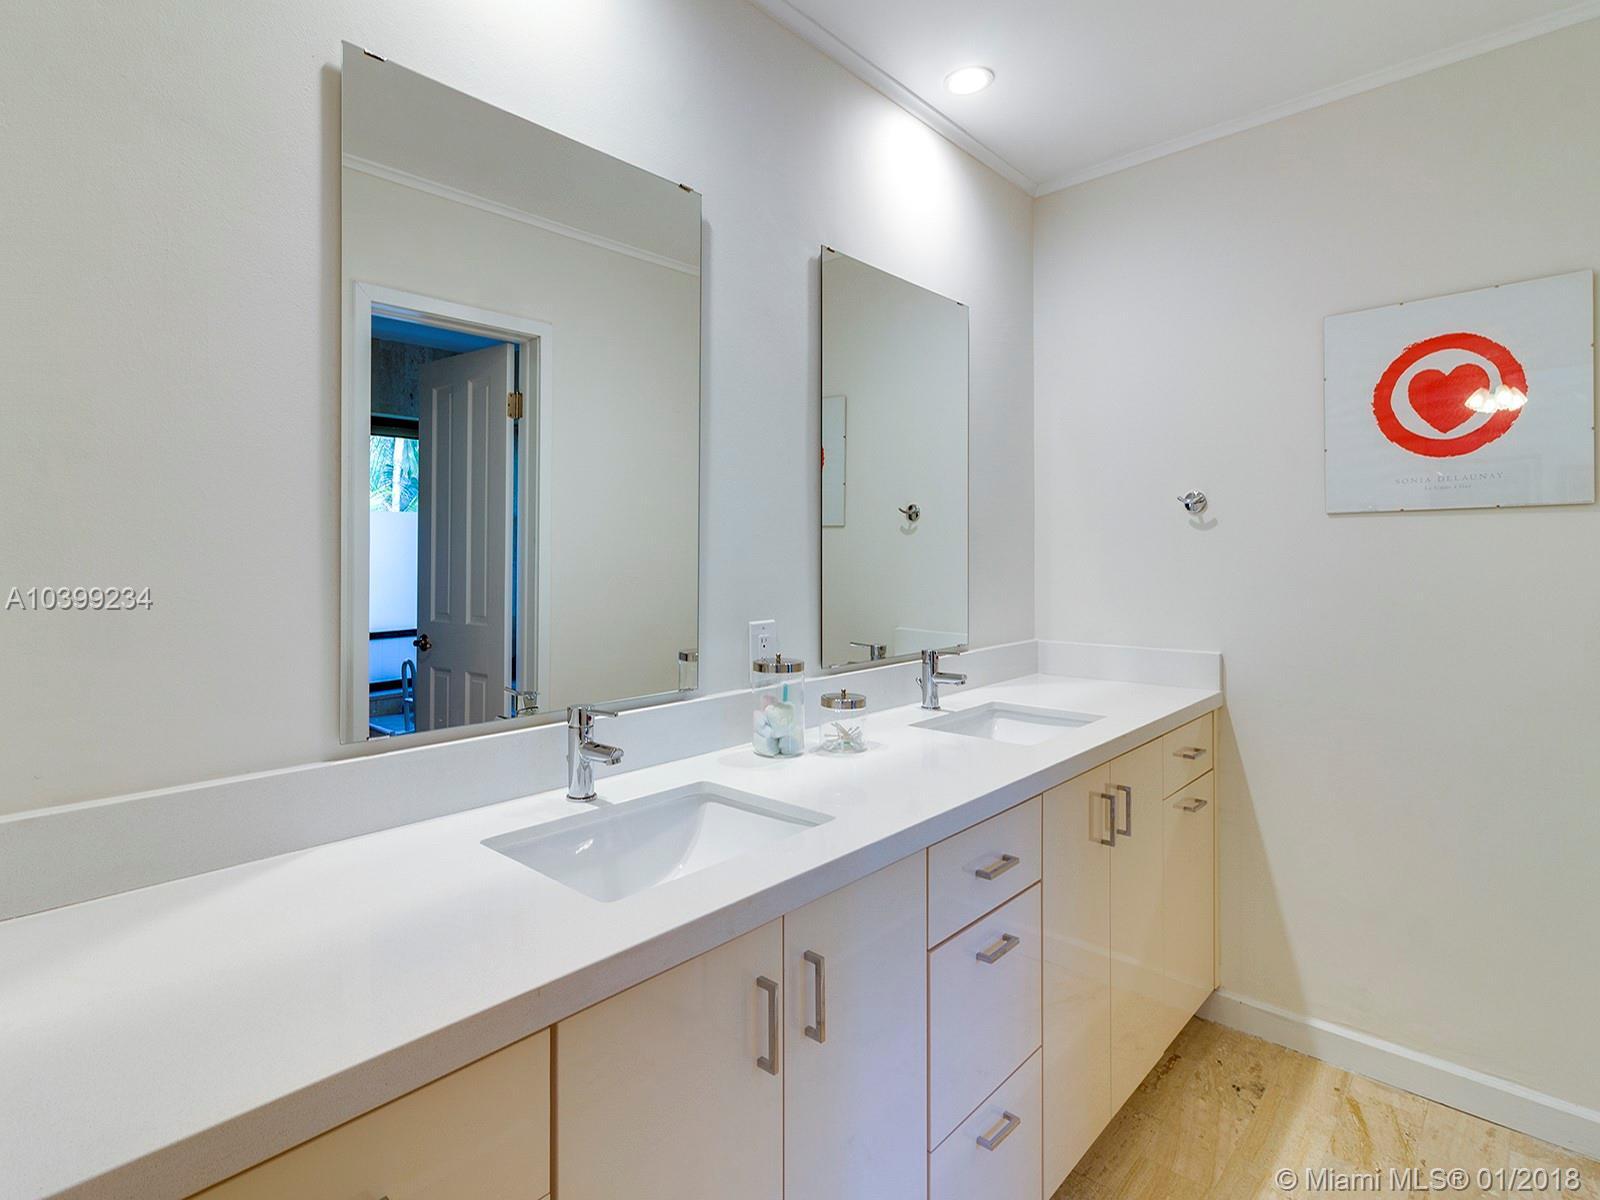 7950 Old Cutler Rd, Coral Gables FL, 33143